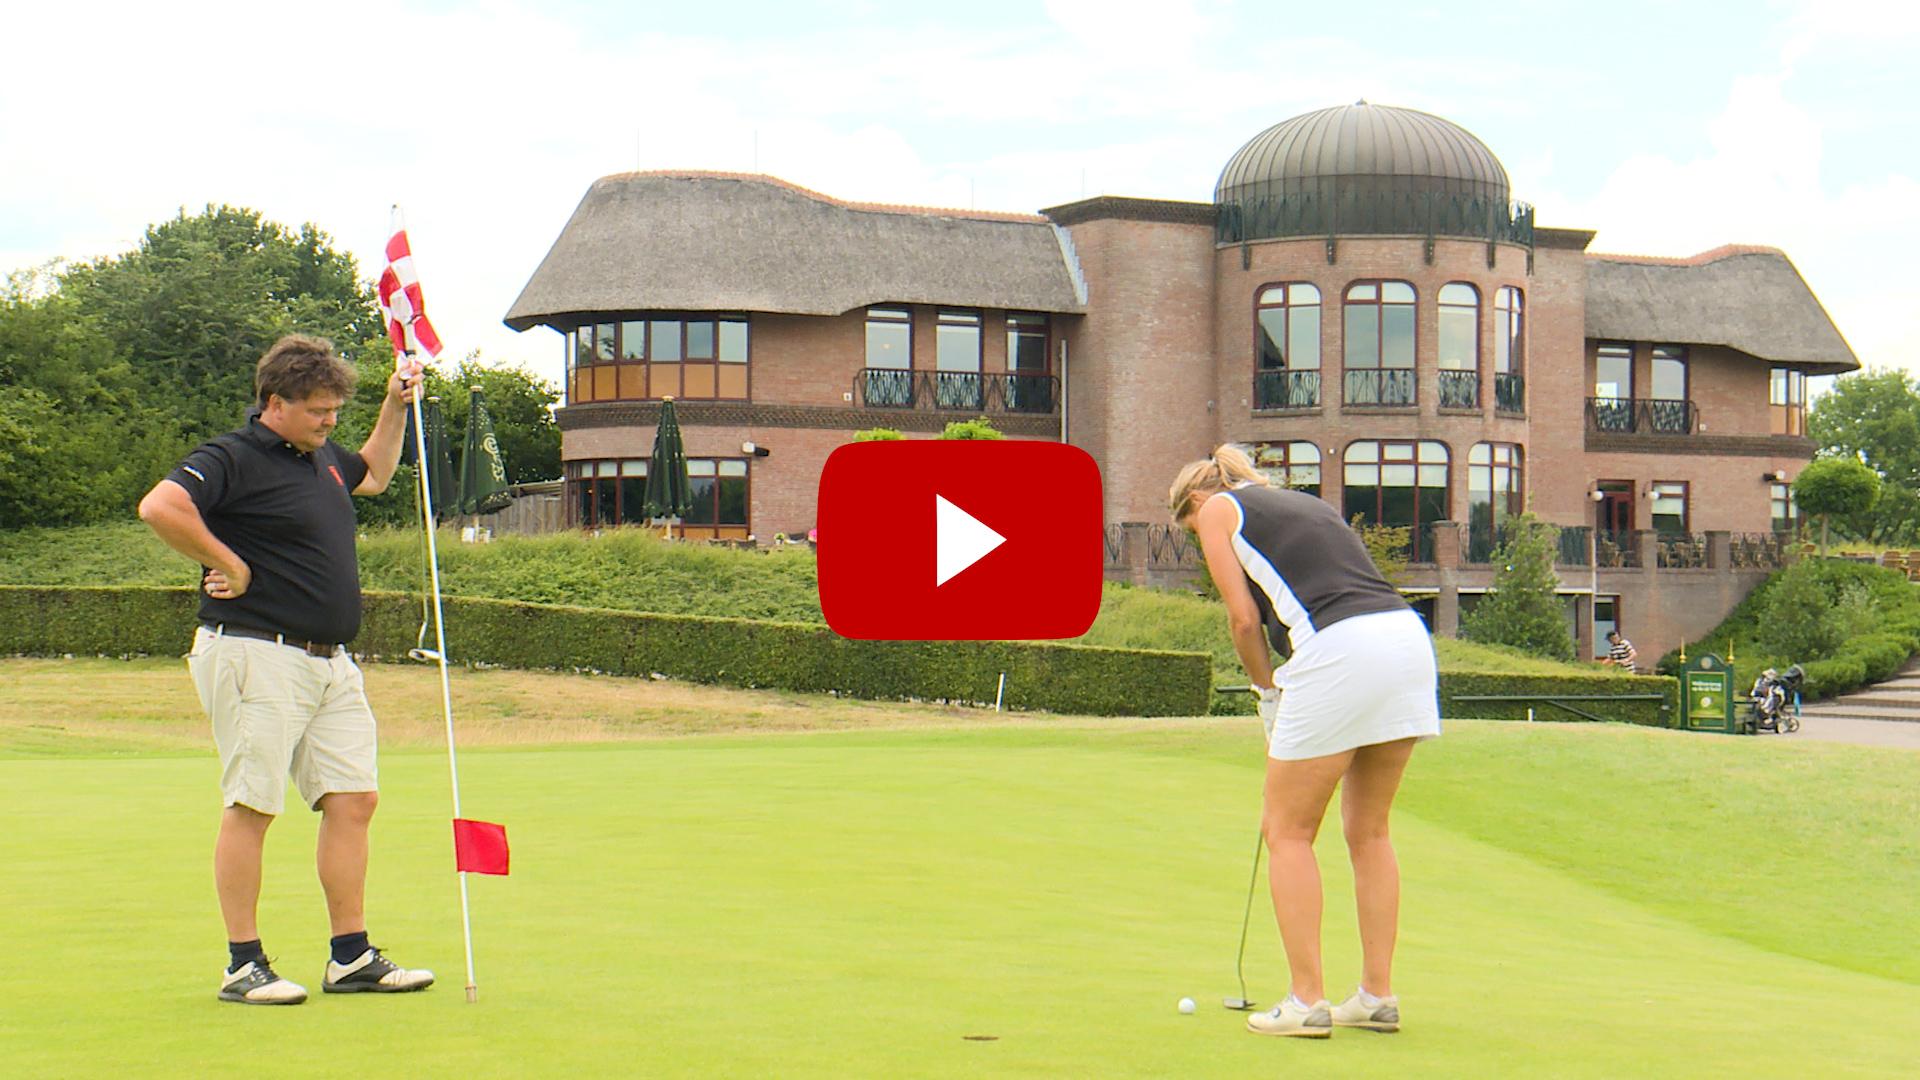 GOLF.NL Baanrapport: Efteling Golfpark • Golf.nl Golf.nl